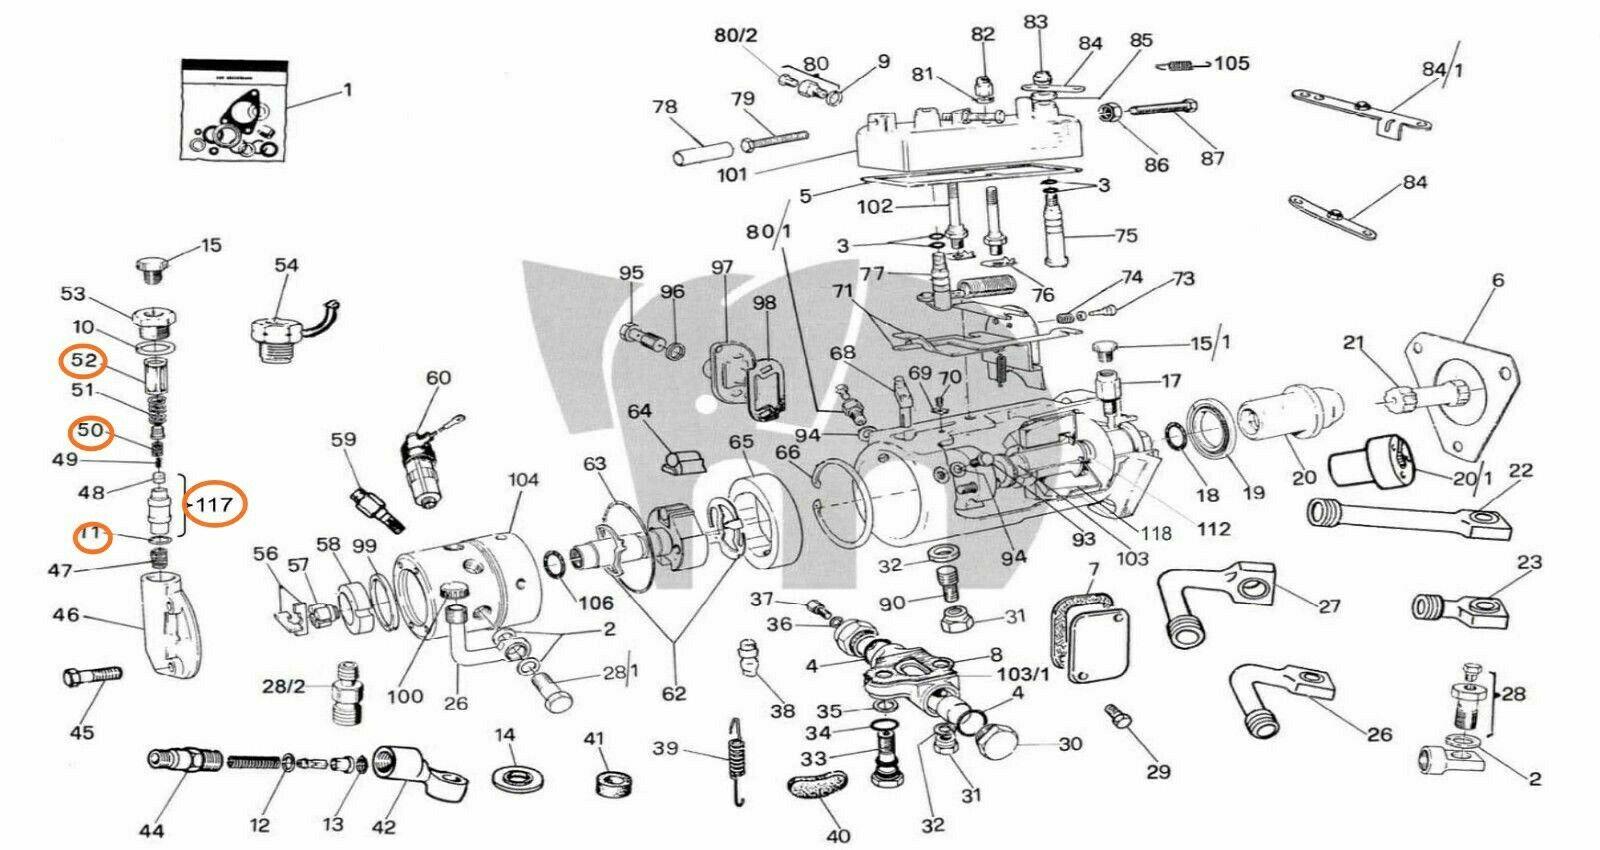 Delphi LUCAS CAV DPA Diesel Fuel injection pump gasket Seal Kit Fits David Brown